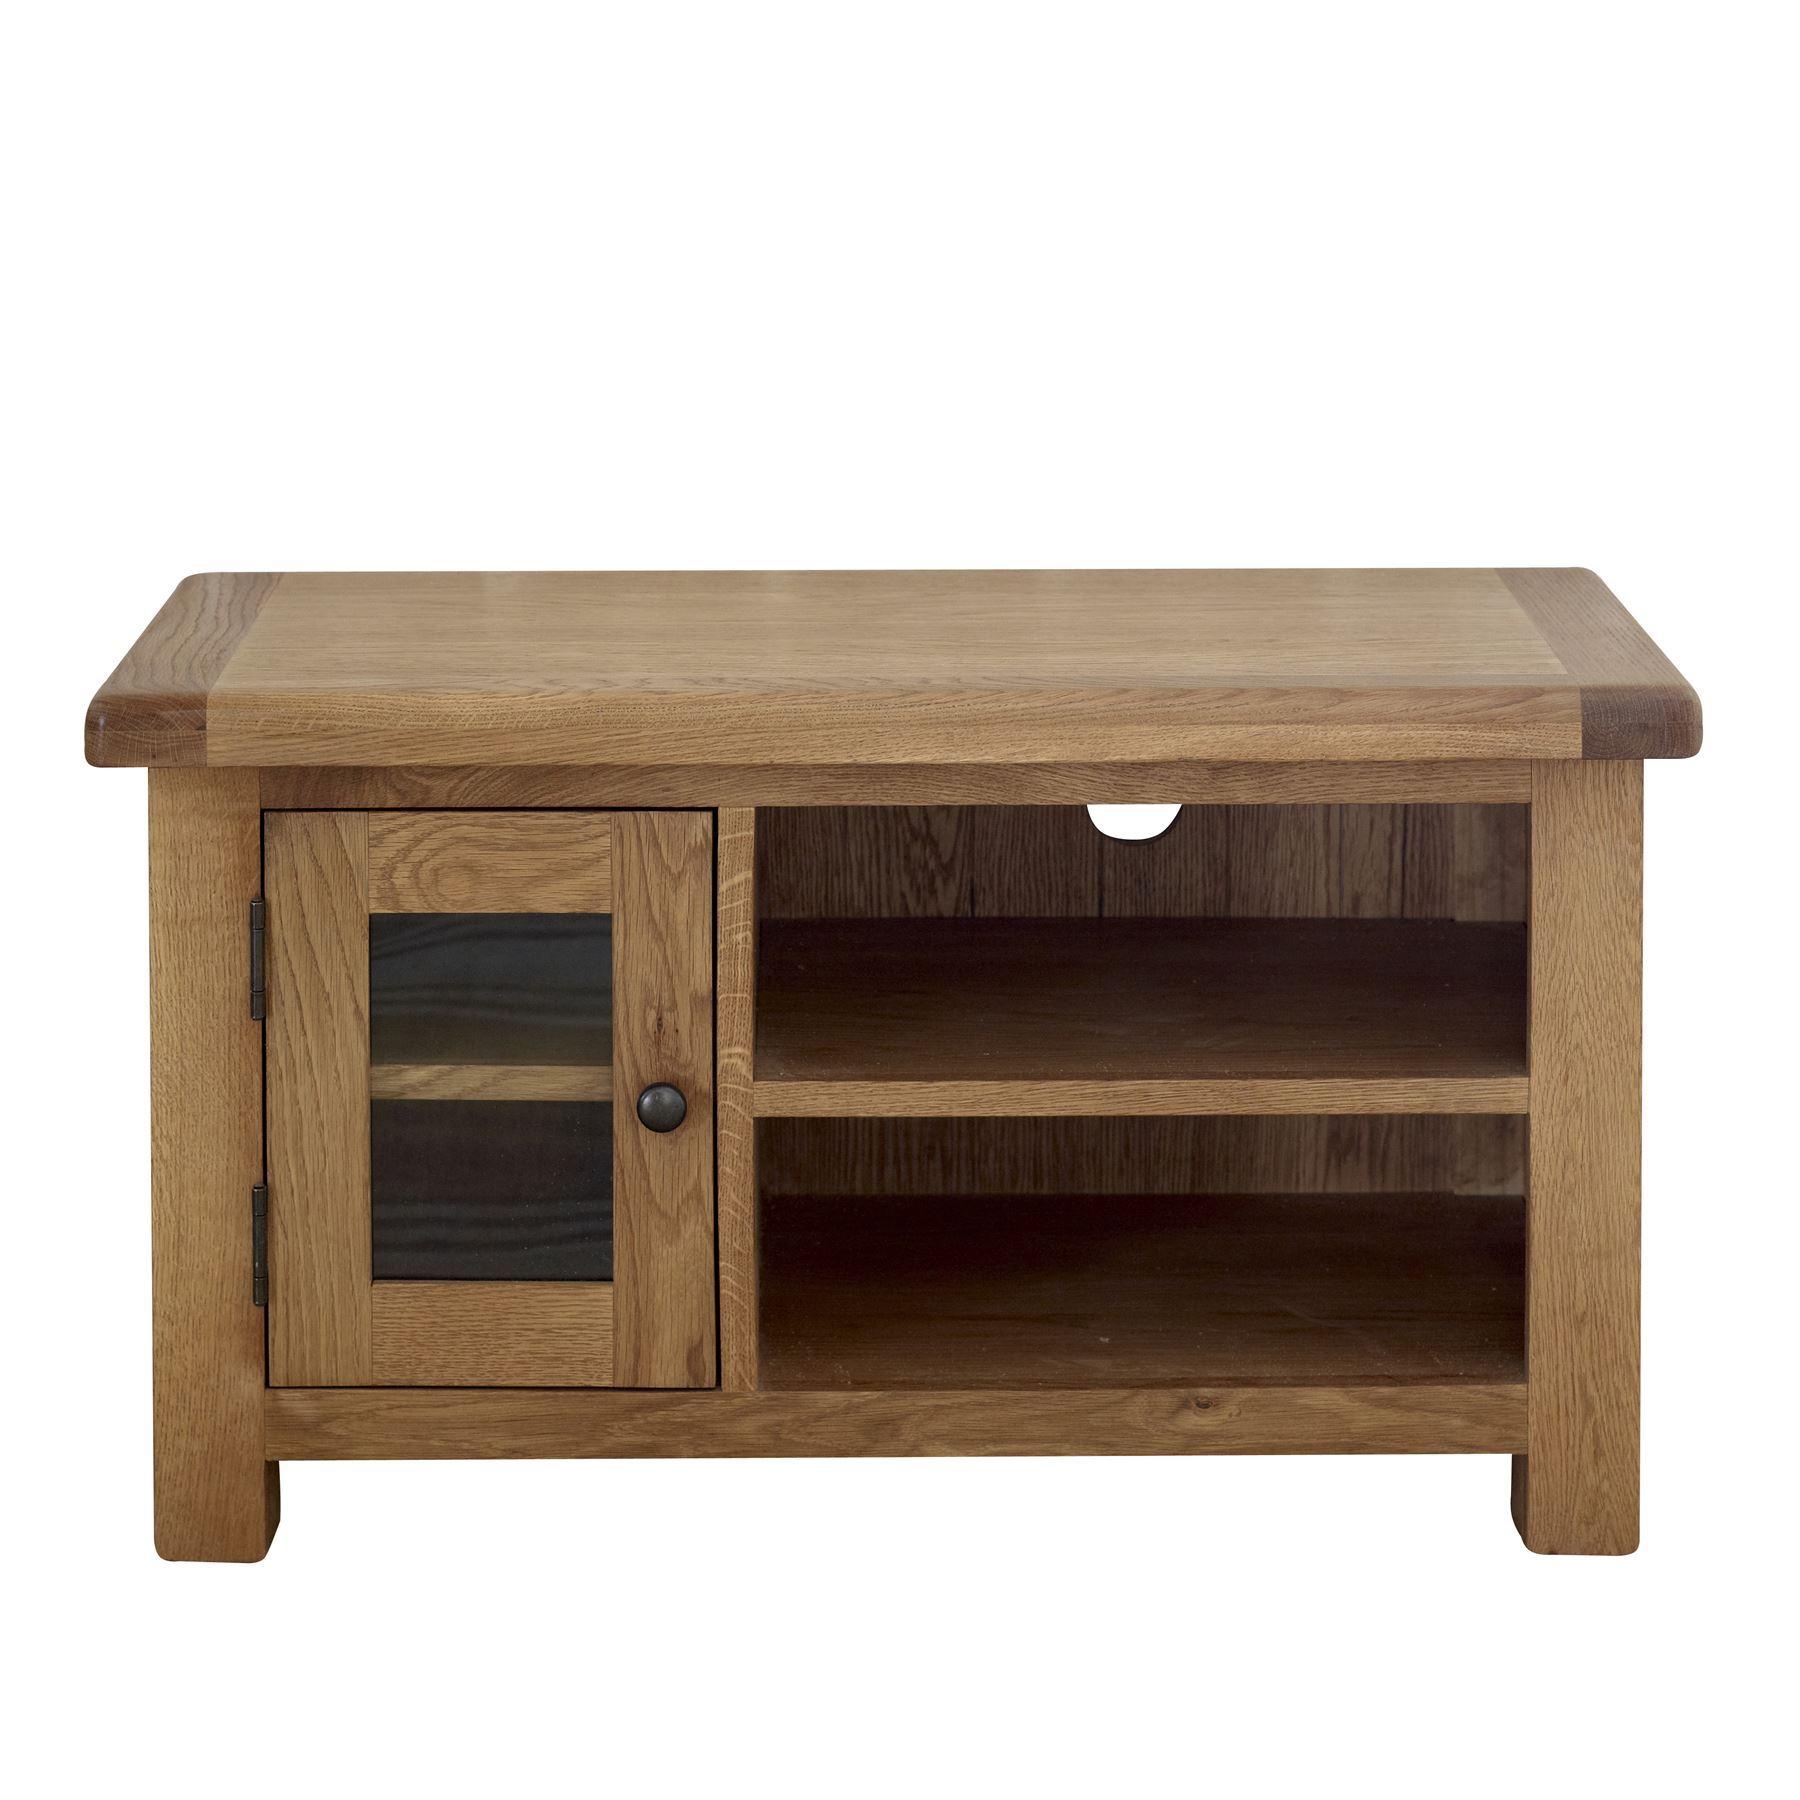 birlea malvern oak wood small tv unit cabinet solid. Black Bedroom Furniture Sets. Home Design Ideas